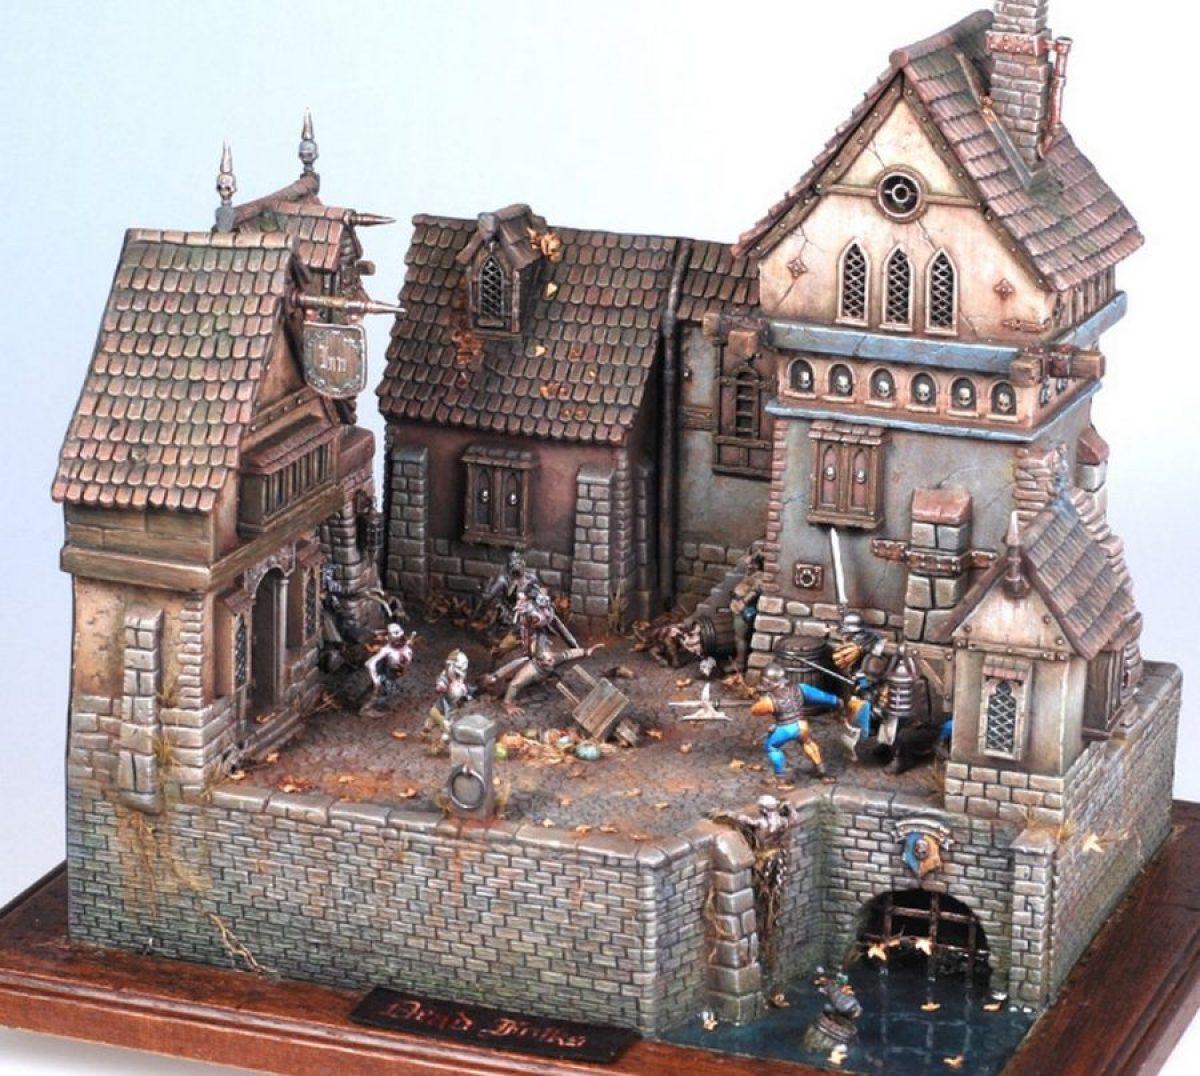 Some crazy cool Warhammer dioramas